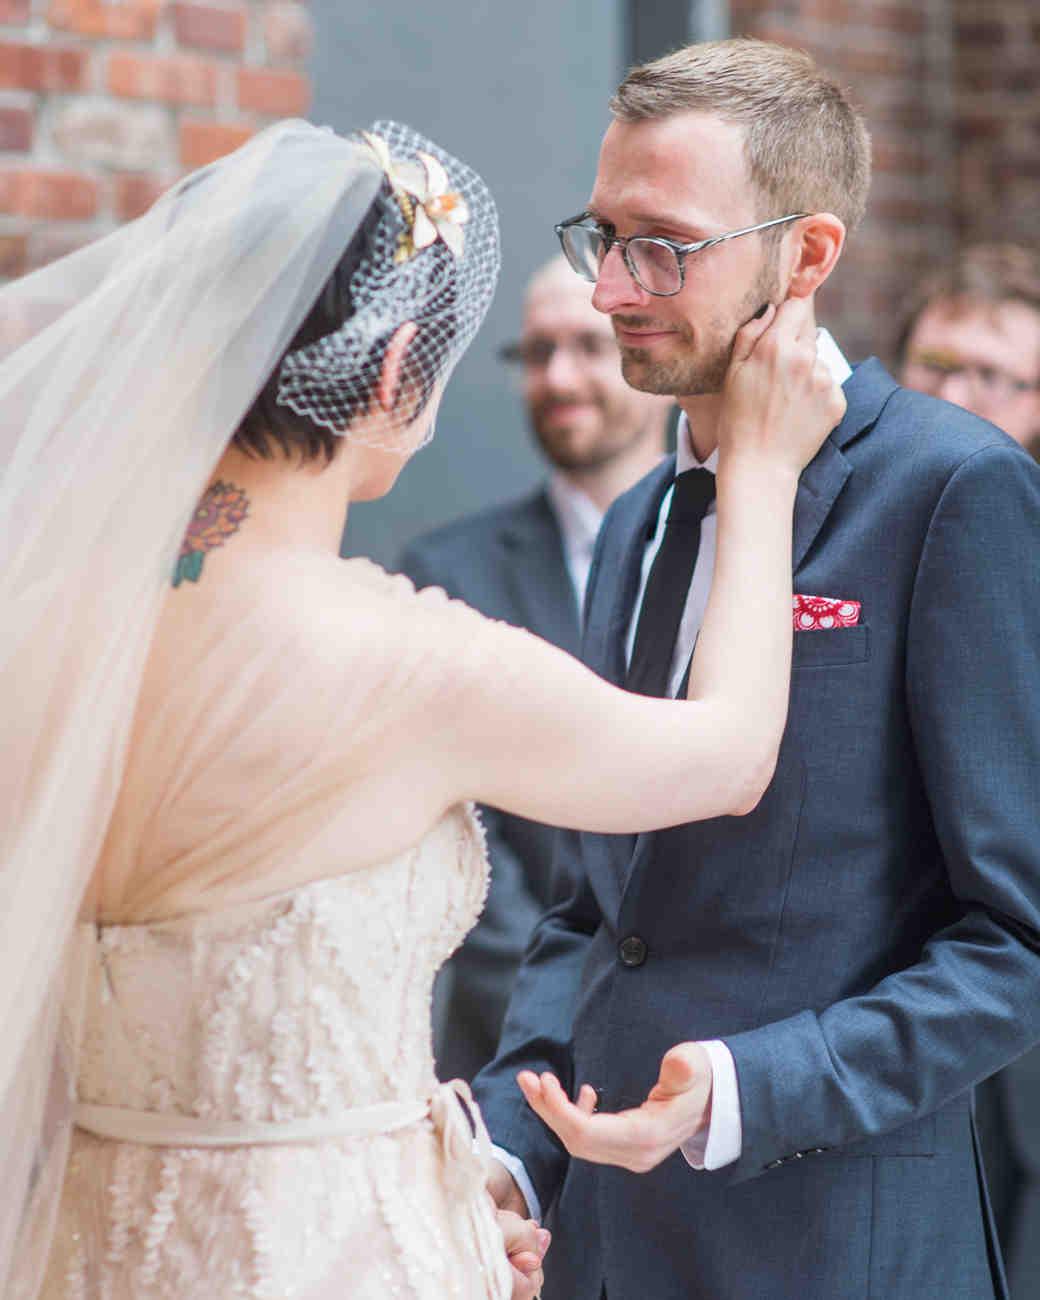 caitlin-michael-wedding-ceremony-333-s111835-0415.jpg